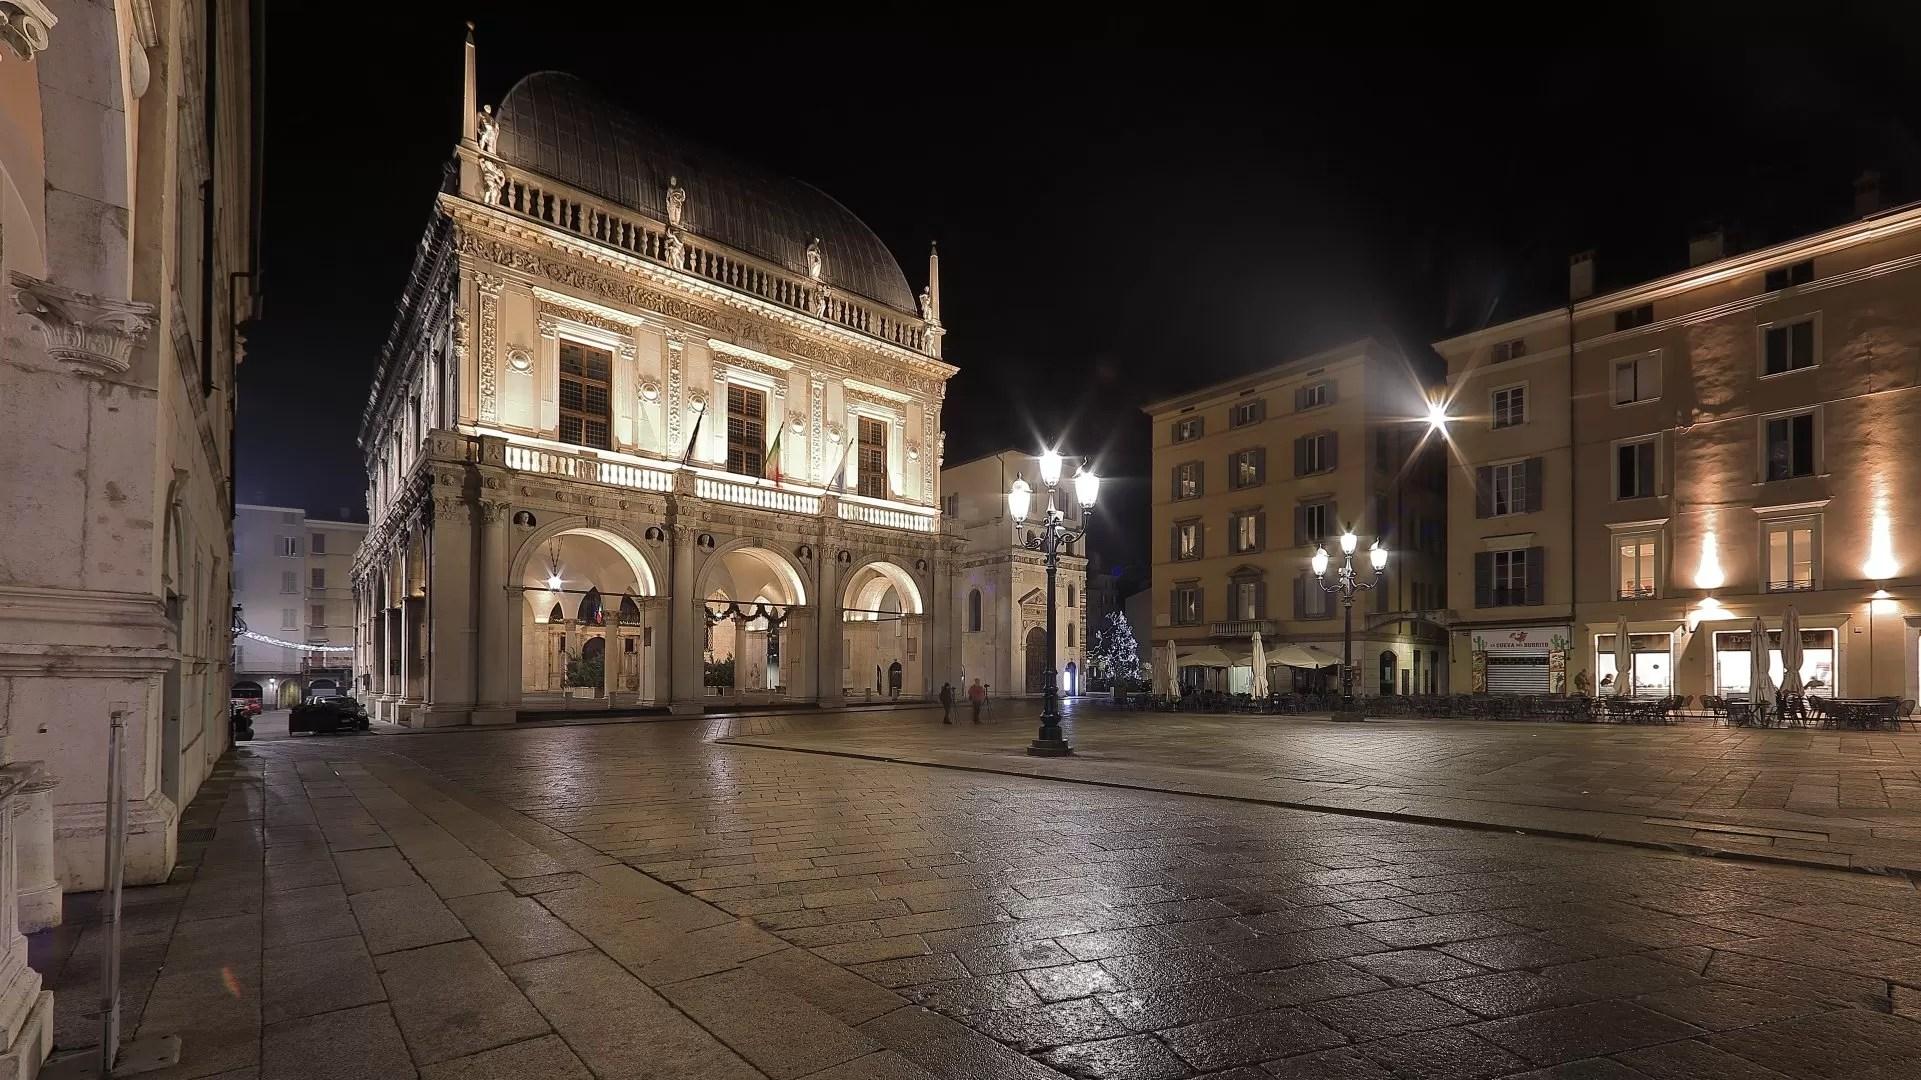 Cartoline-italia-fotografie-immagini-federici-marco-fotografo